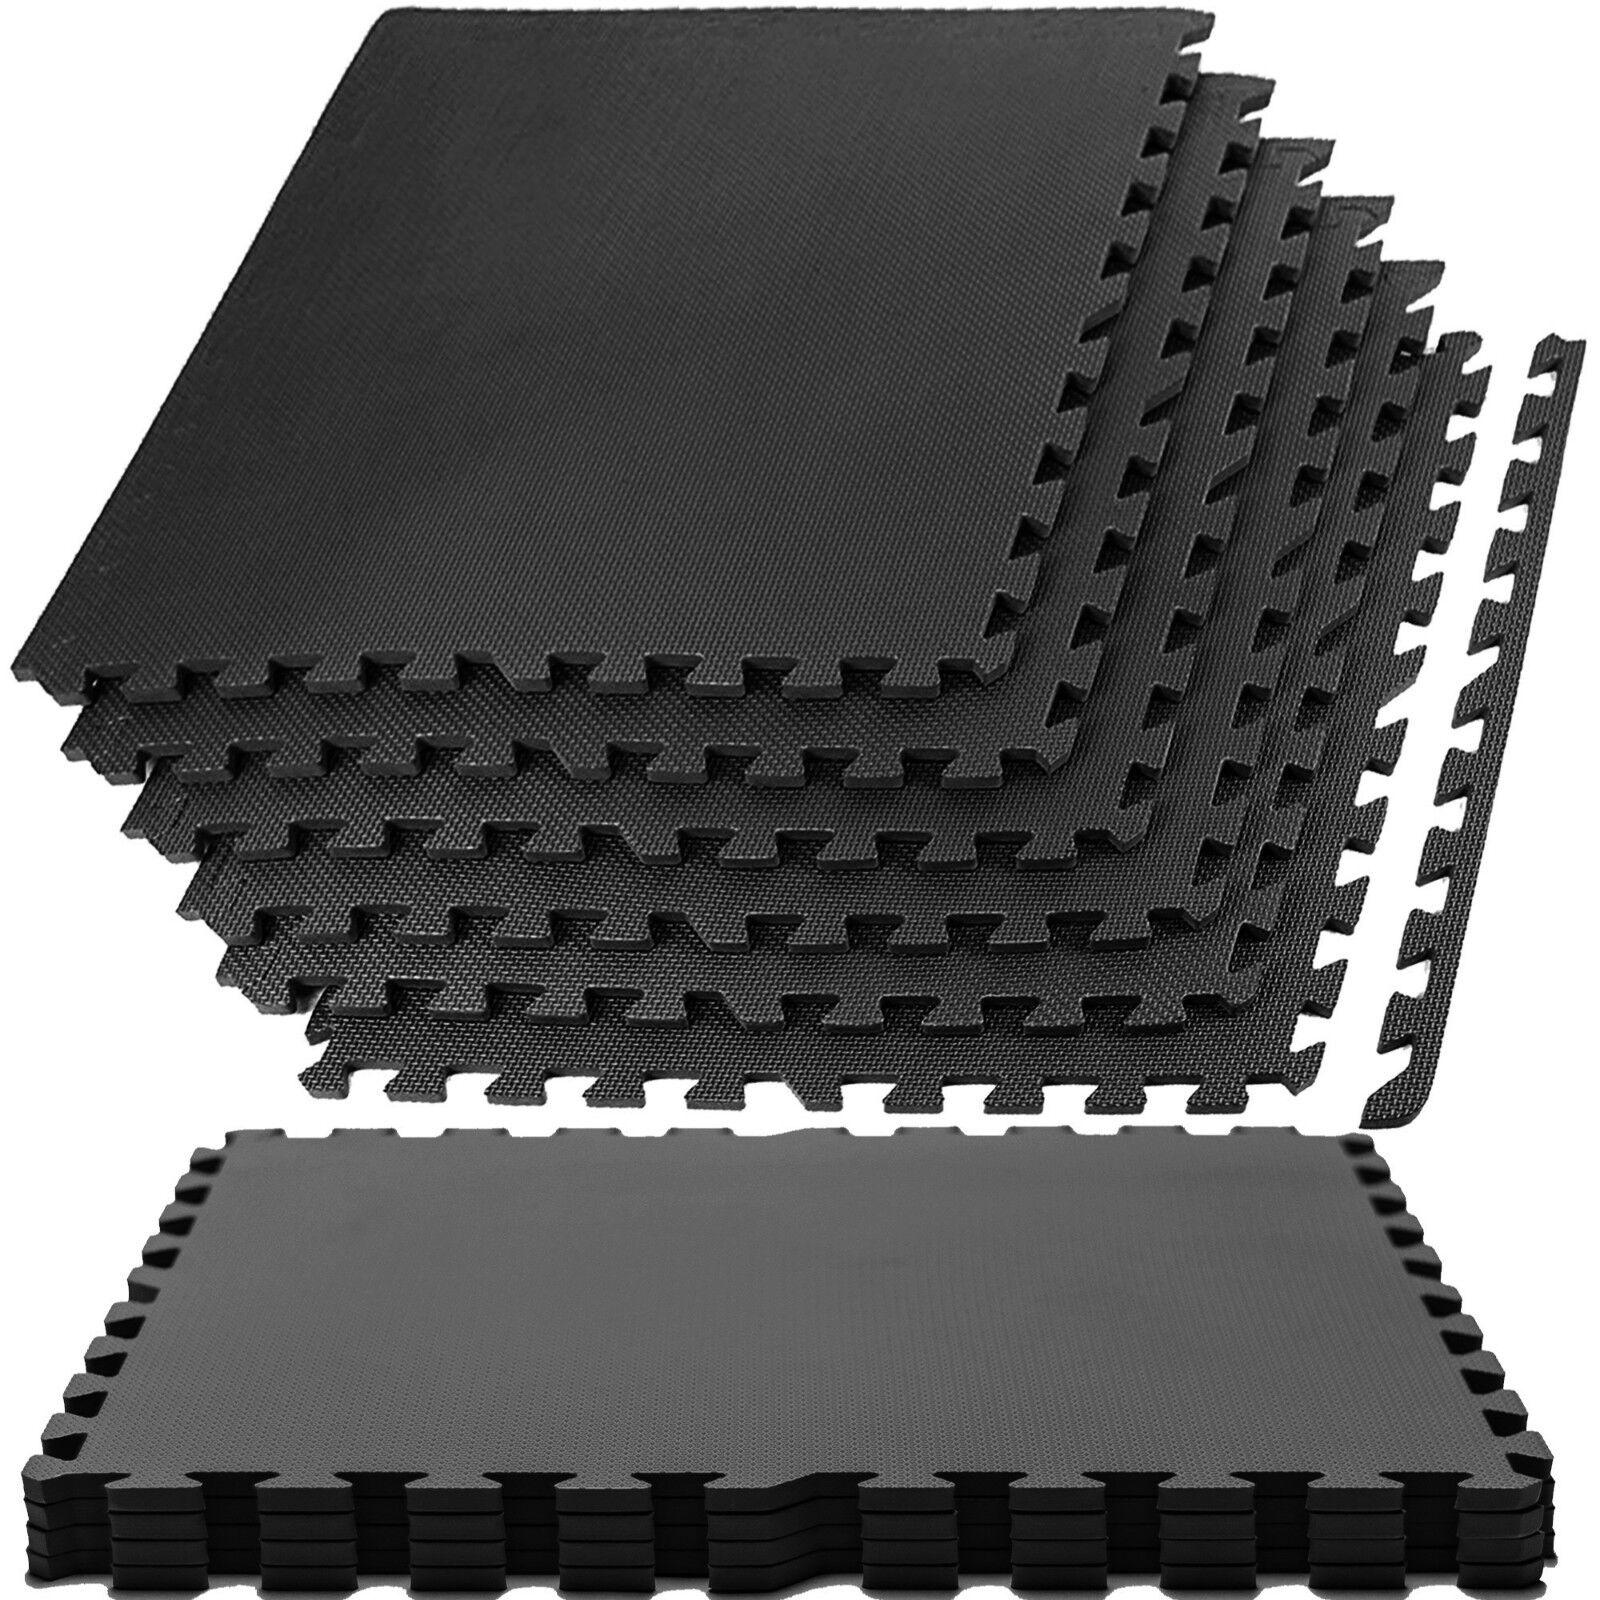 Large black interlocking eva foam floor mats tiles gym play garage